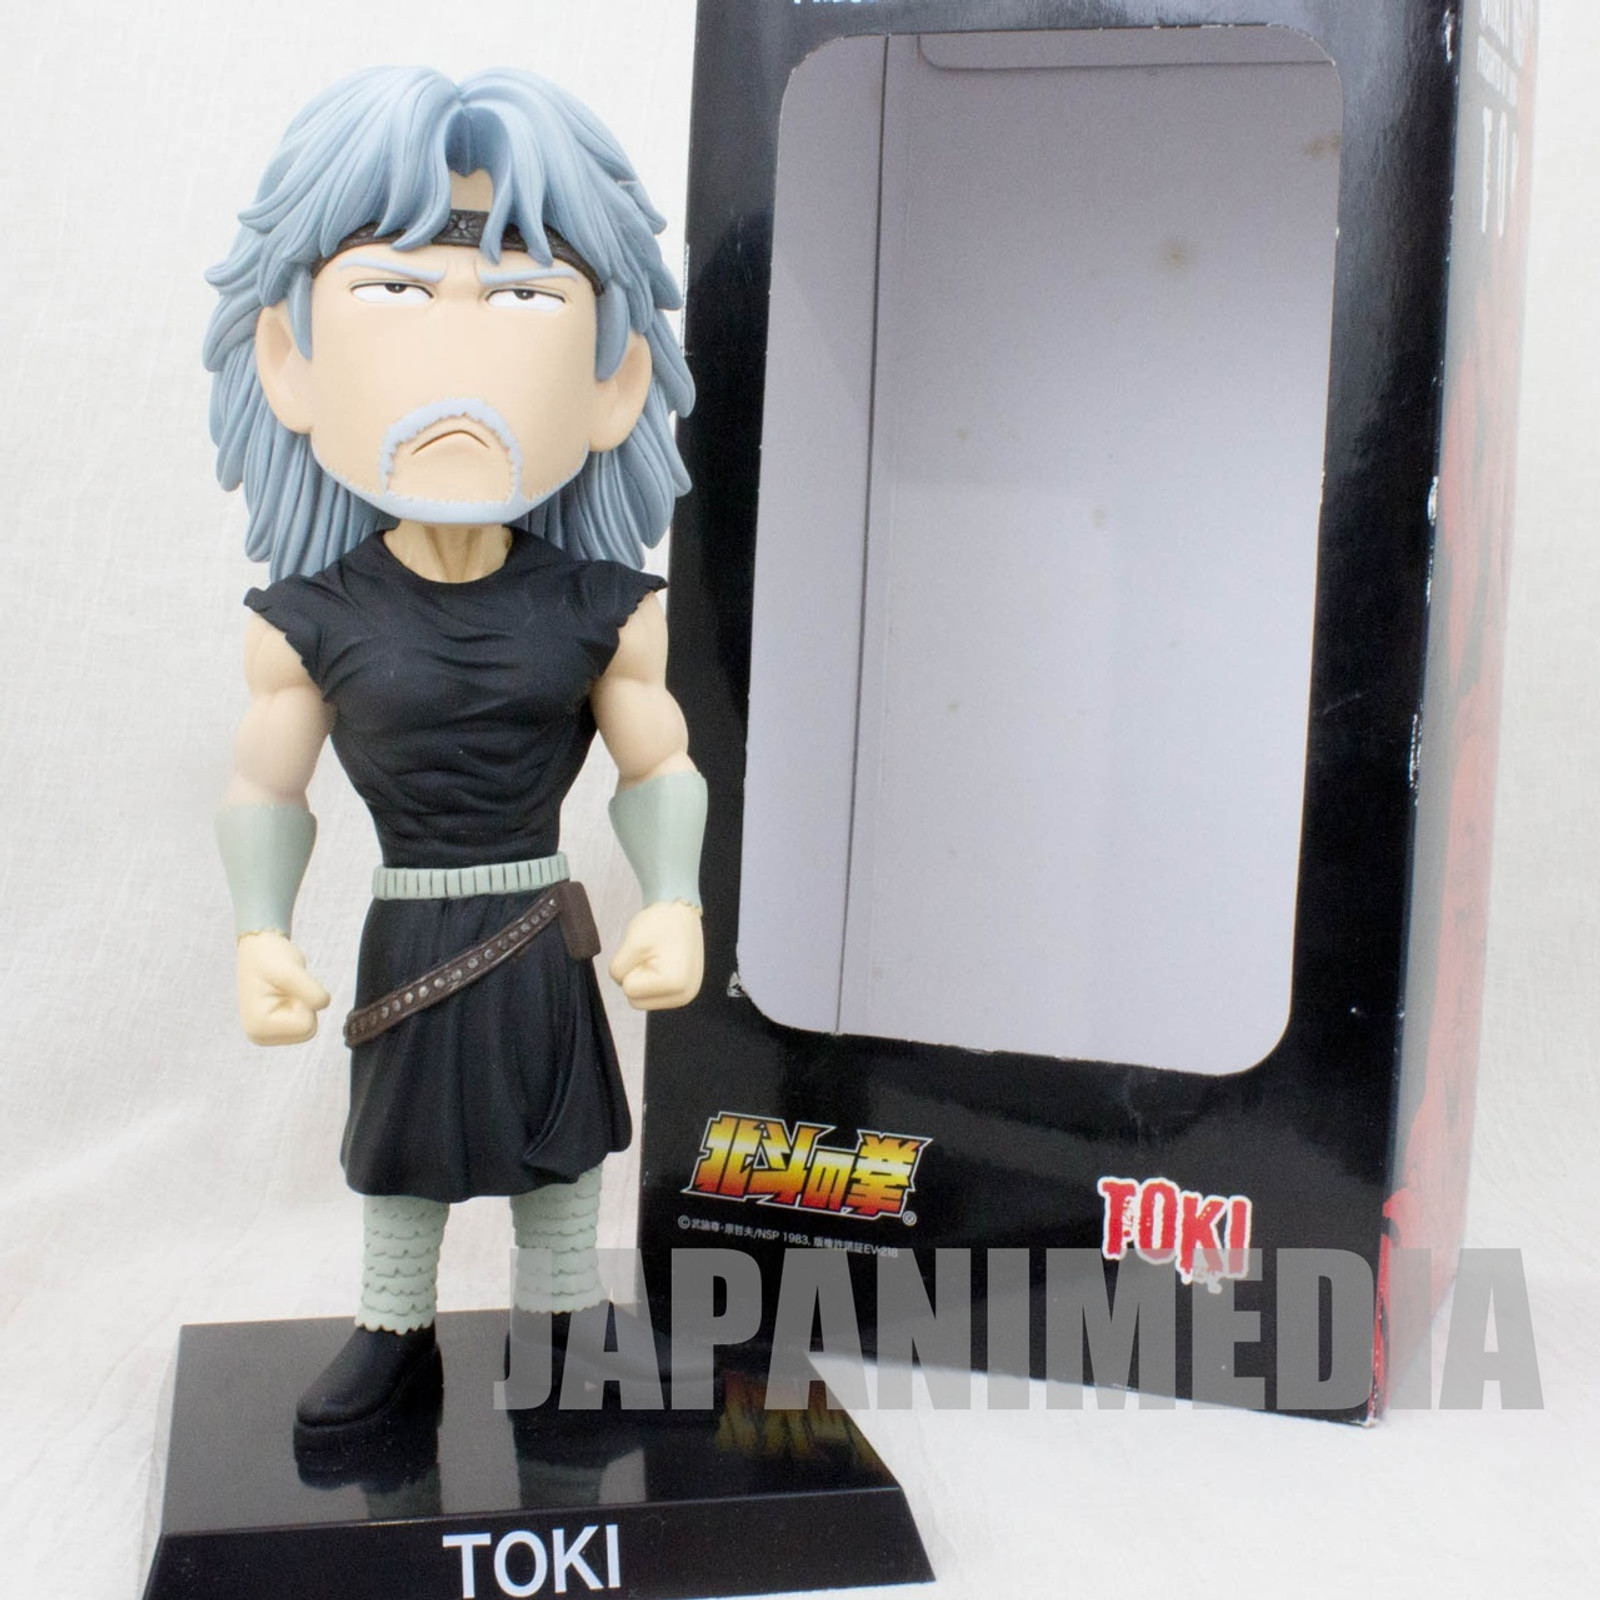 "Fist of the North Star TOKI Bobbing Bobble Head Figure 9"" Hokuto no Ken JAPAN"